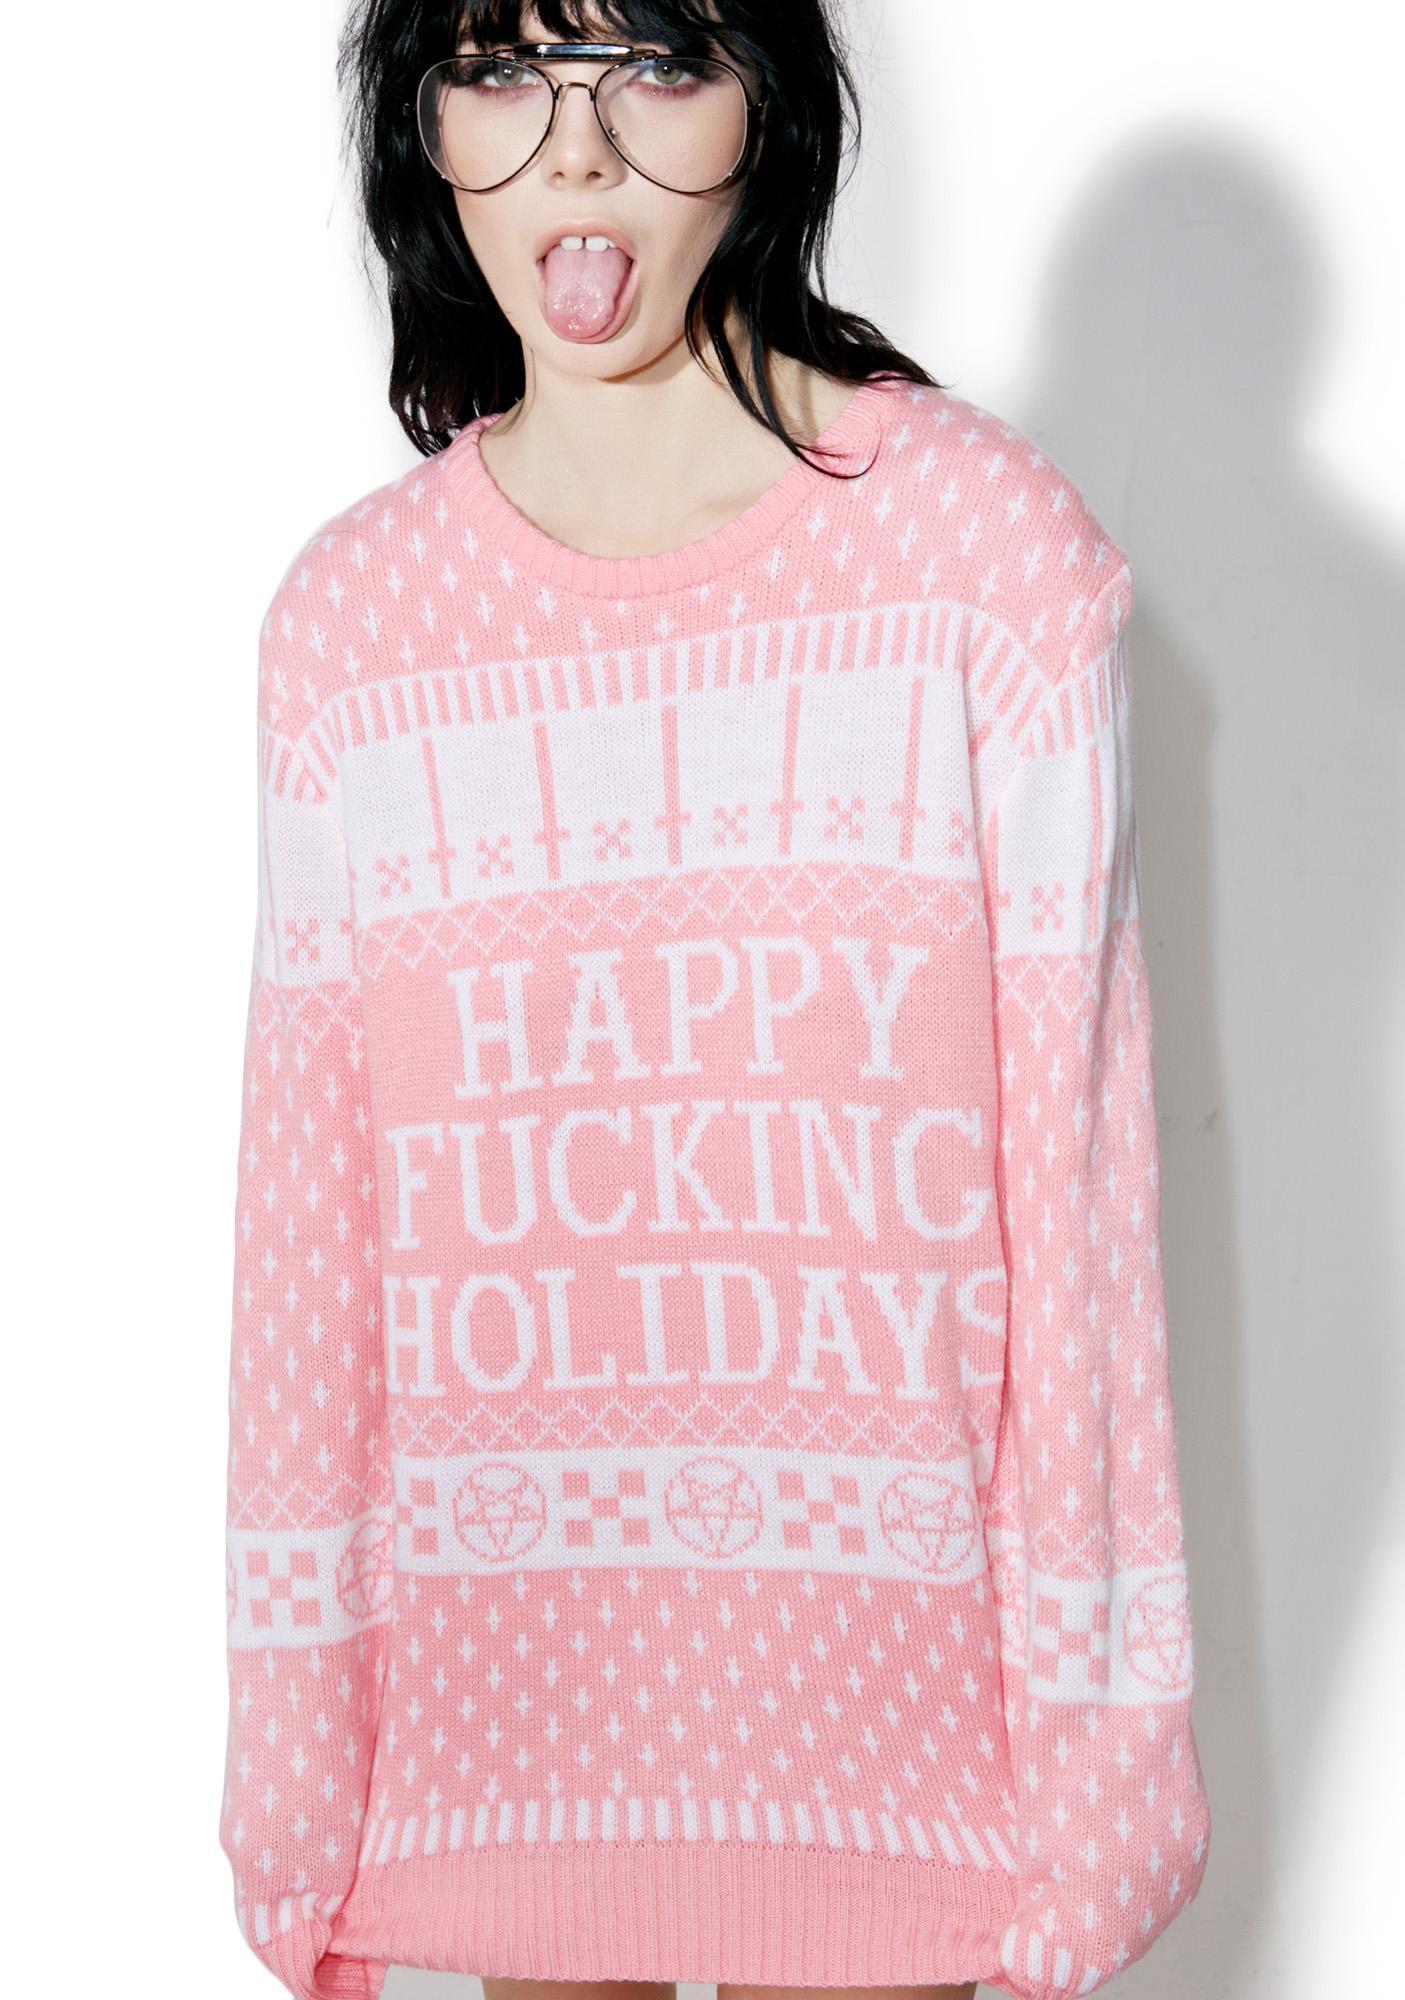 Current Mood Happy Fucking Holidays Sweater